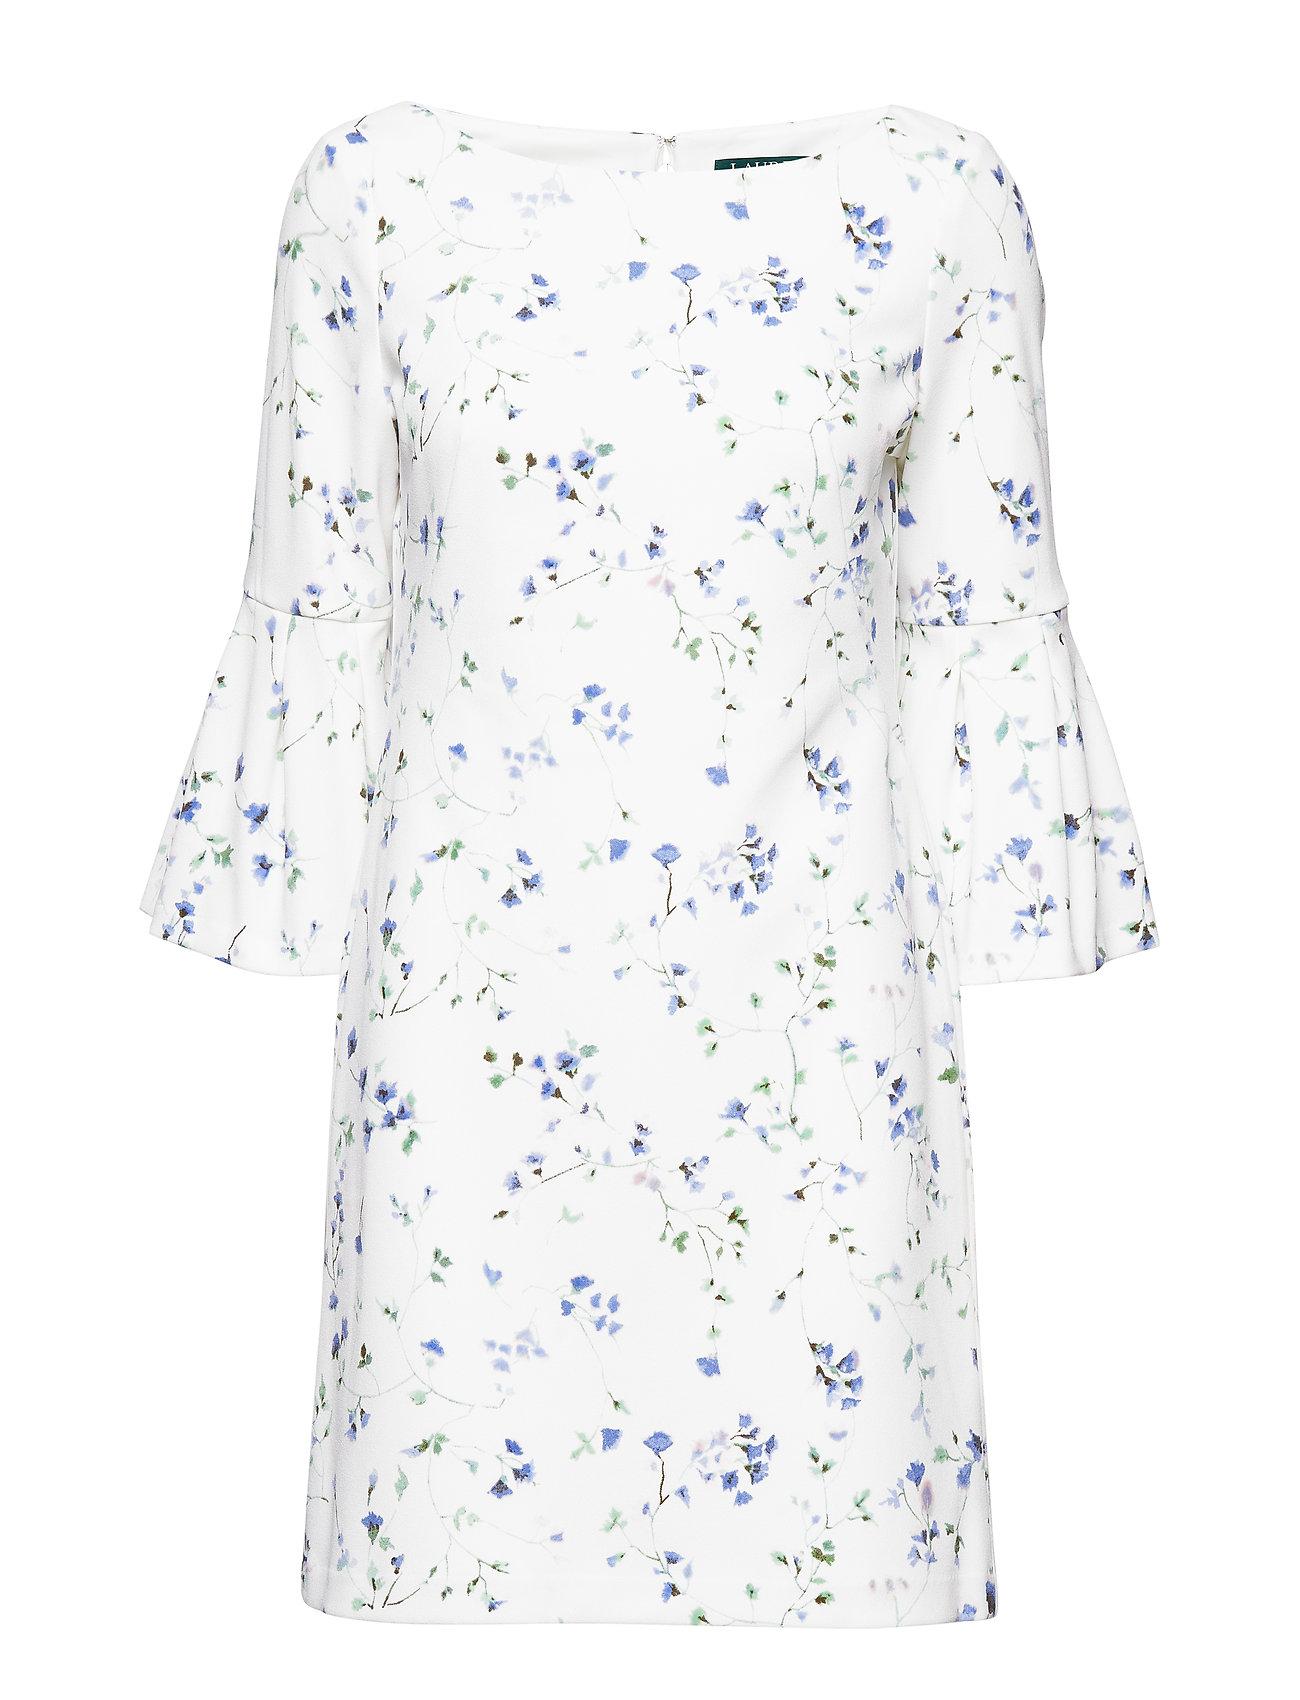 Lauren Ralph Lauren Floral Bell-Sleeve Dress - MASCARPONE CREAM/